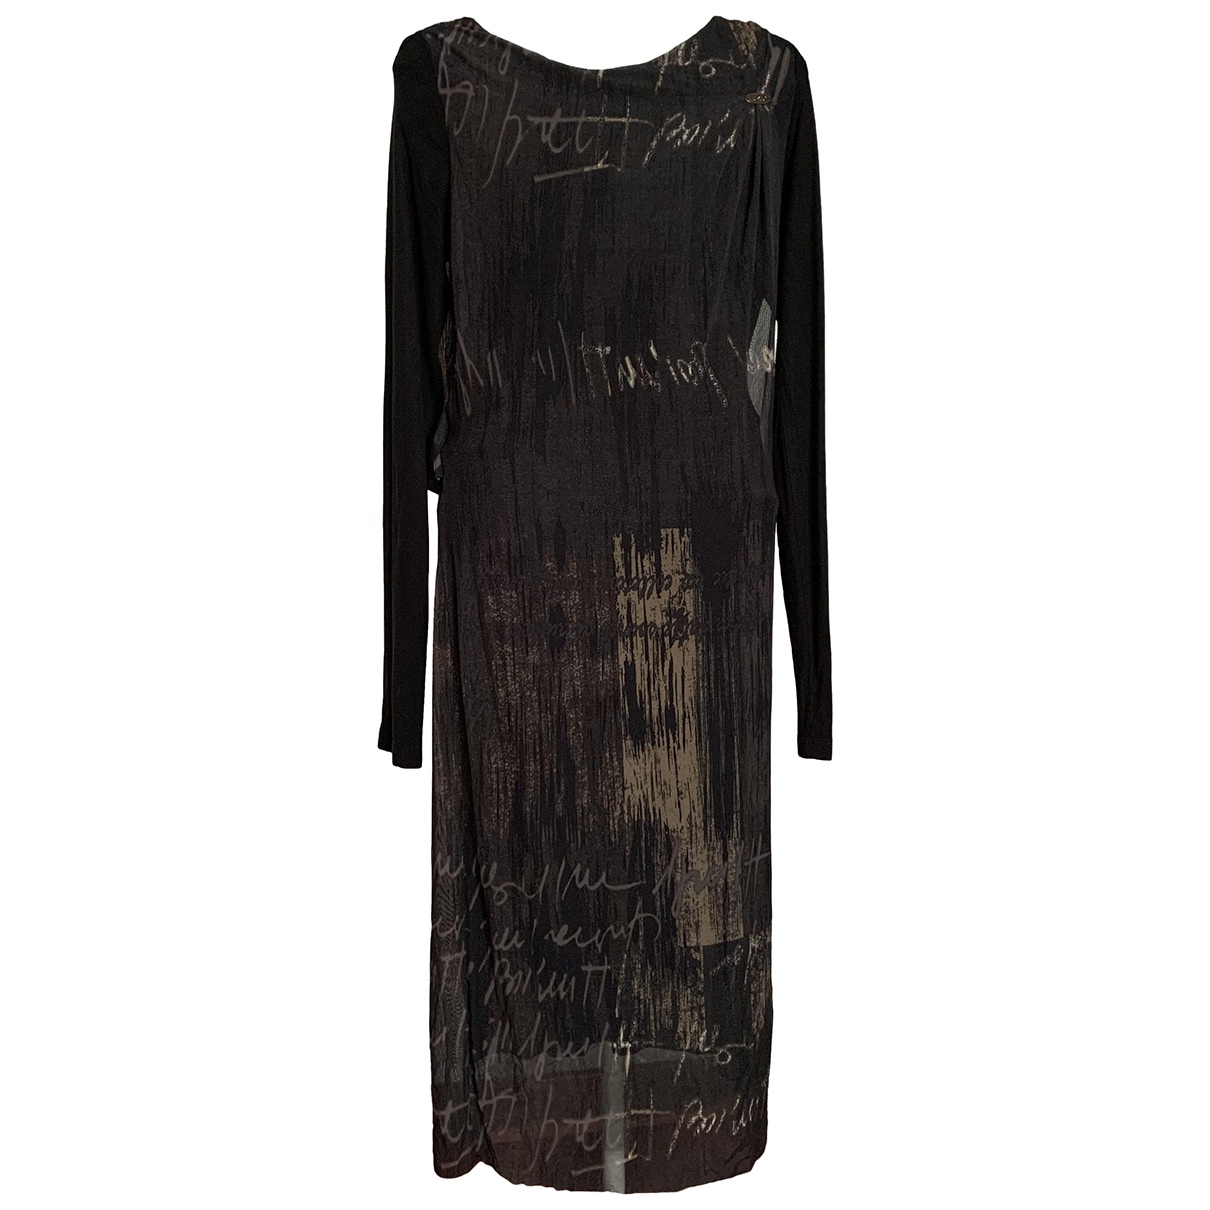 Liu.jo \N Kleid in  Anthrazit Polyester